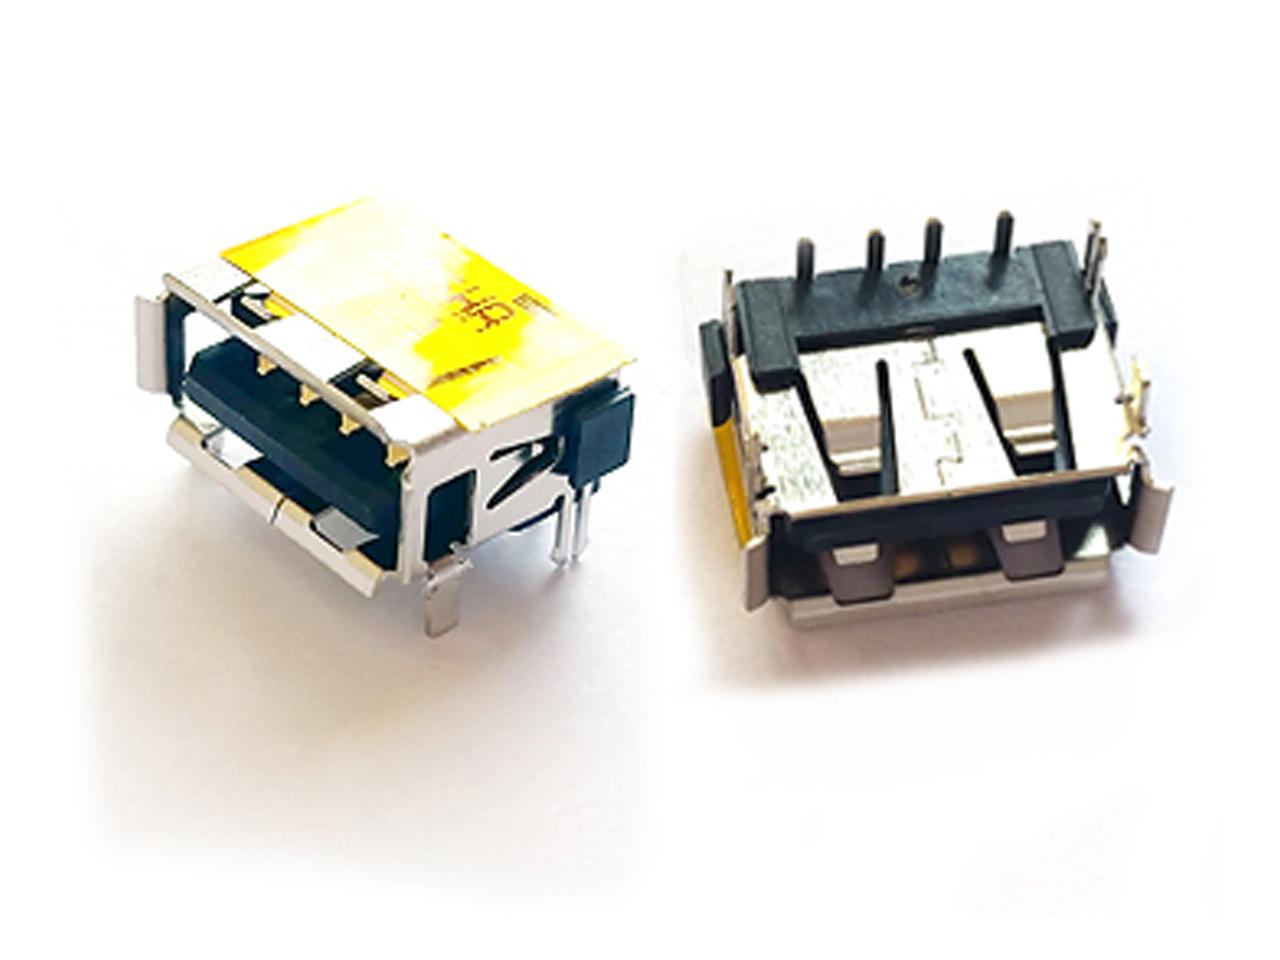 ACER 4930 USB DRIVERS WINDOWS 7